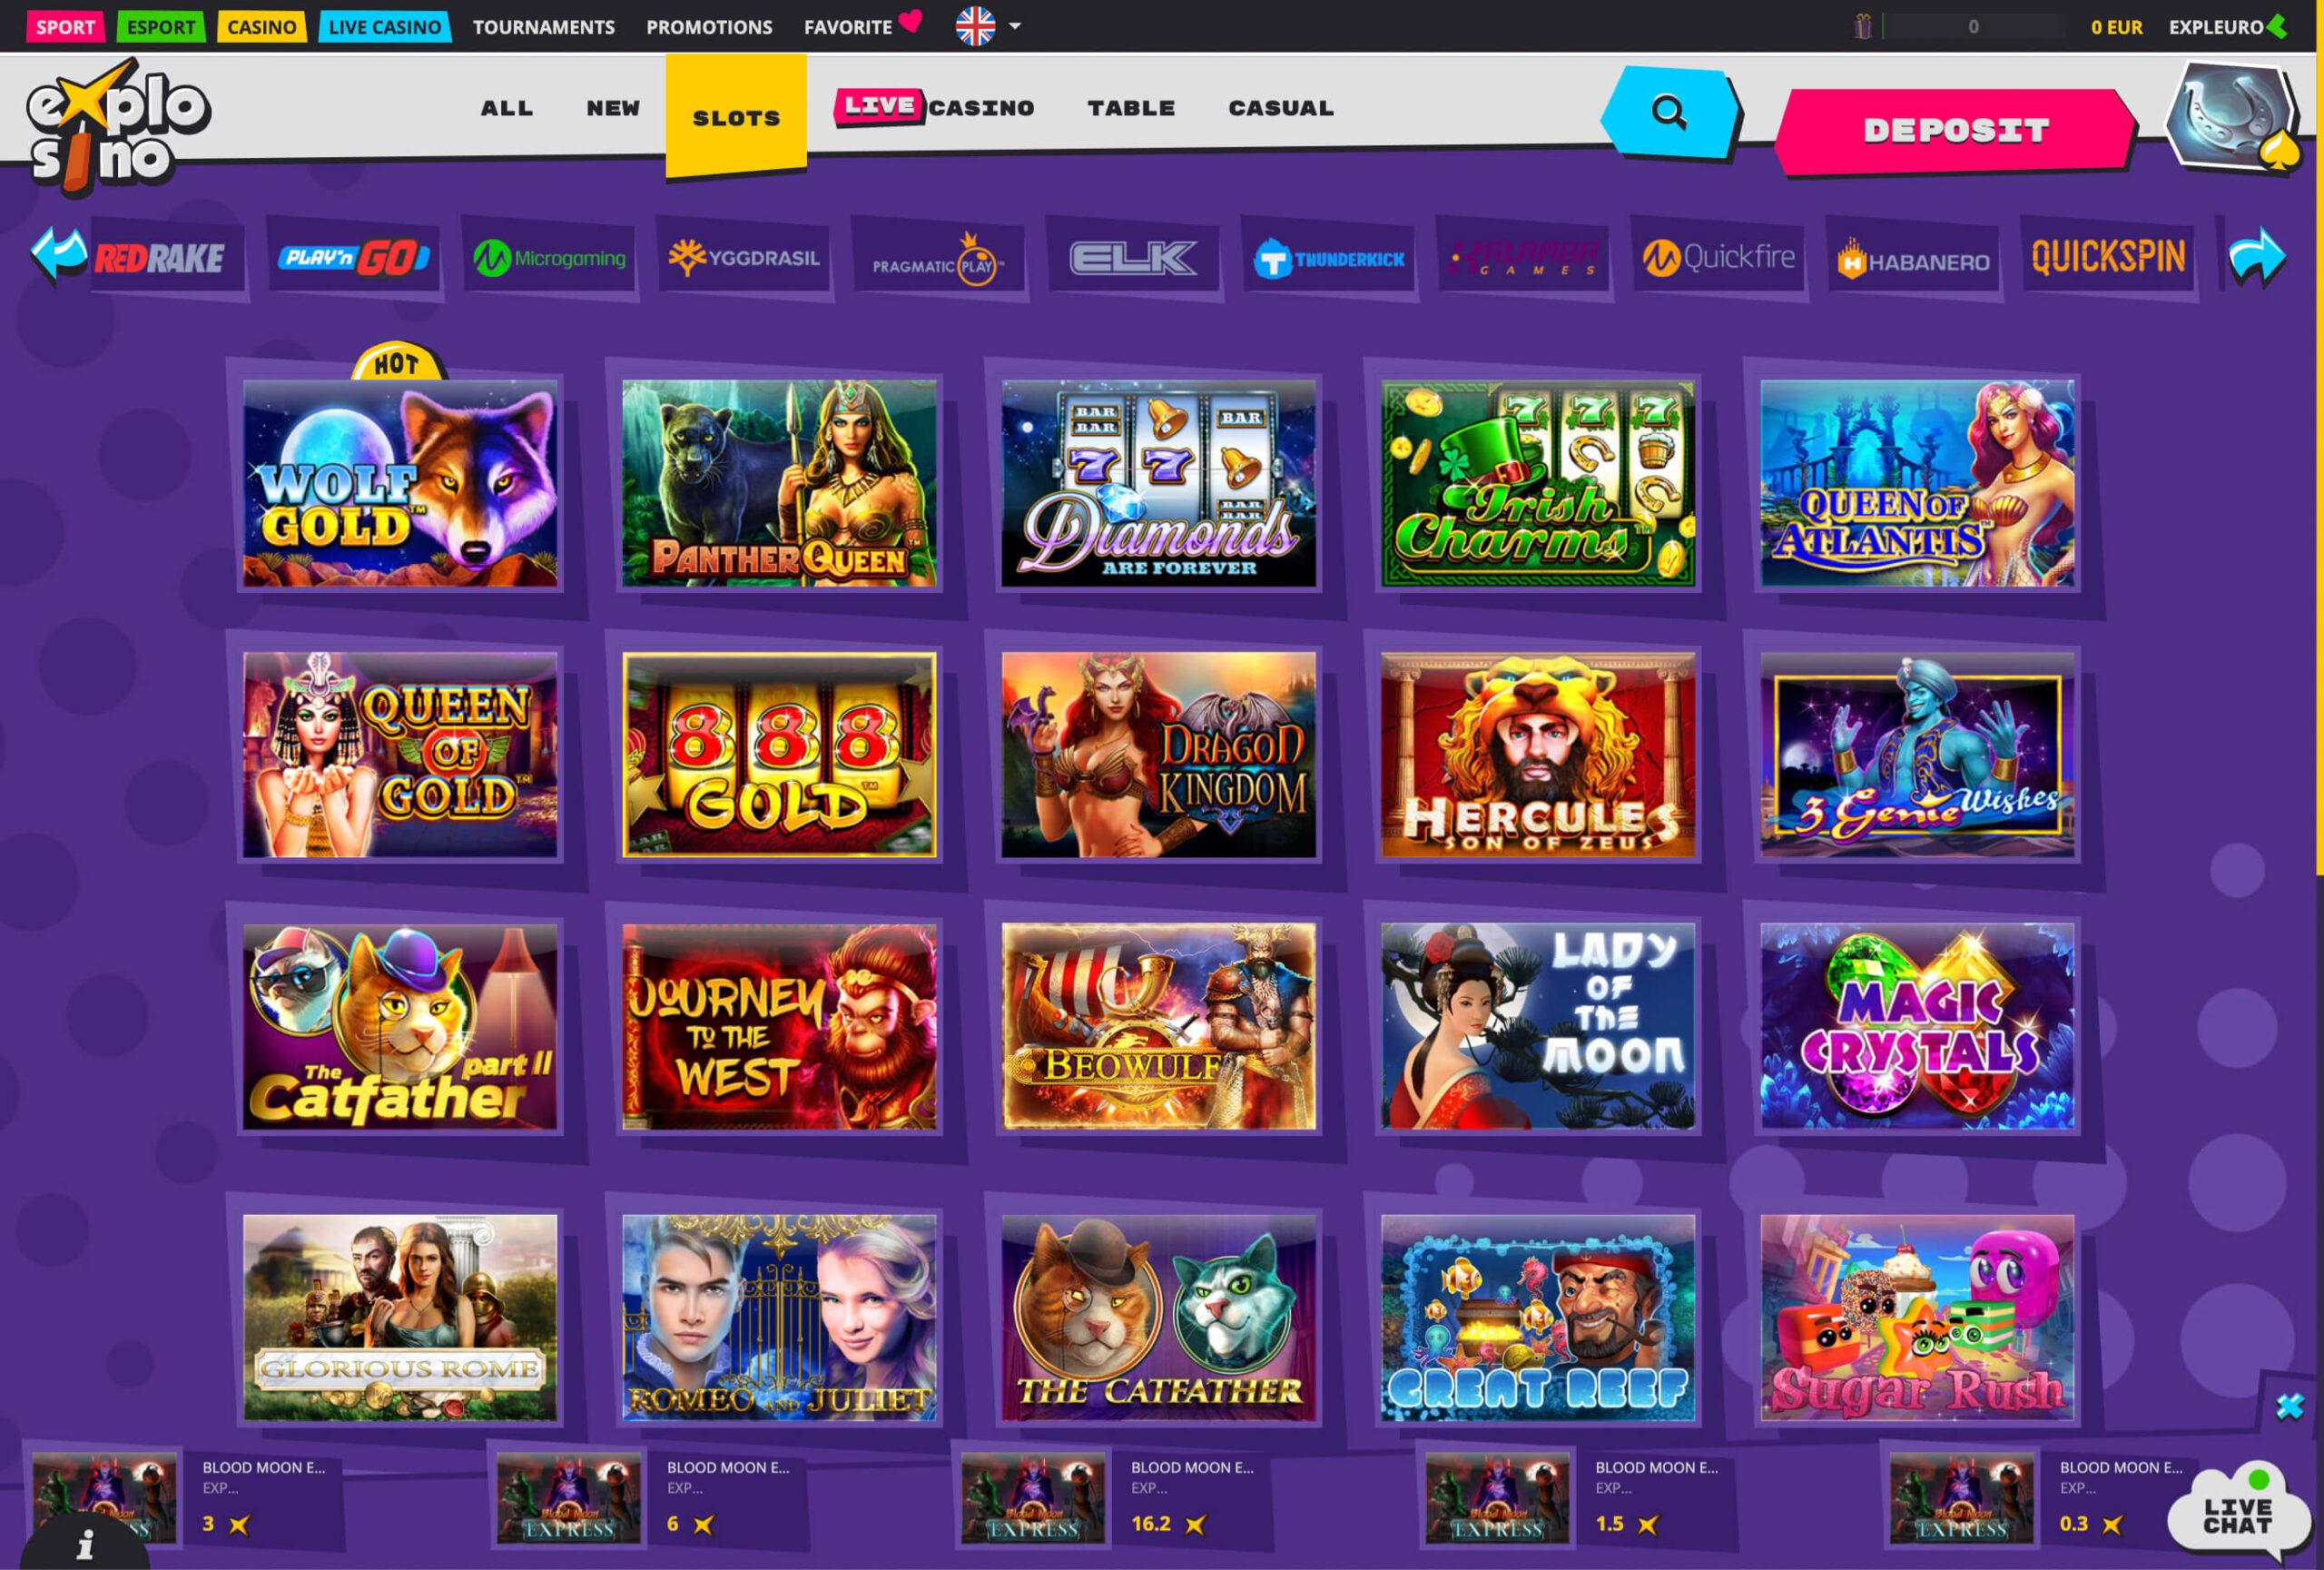 Explosino casino games